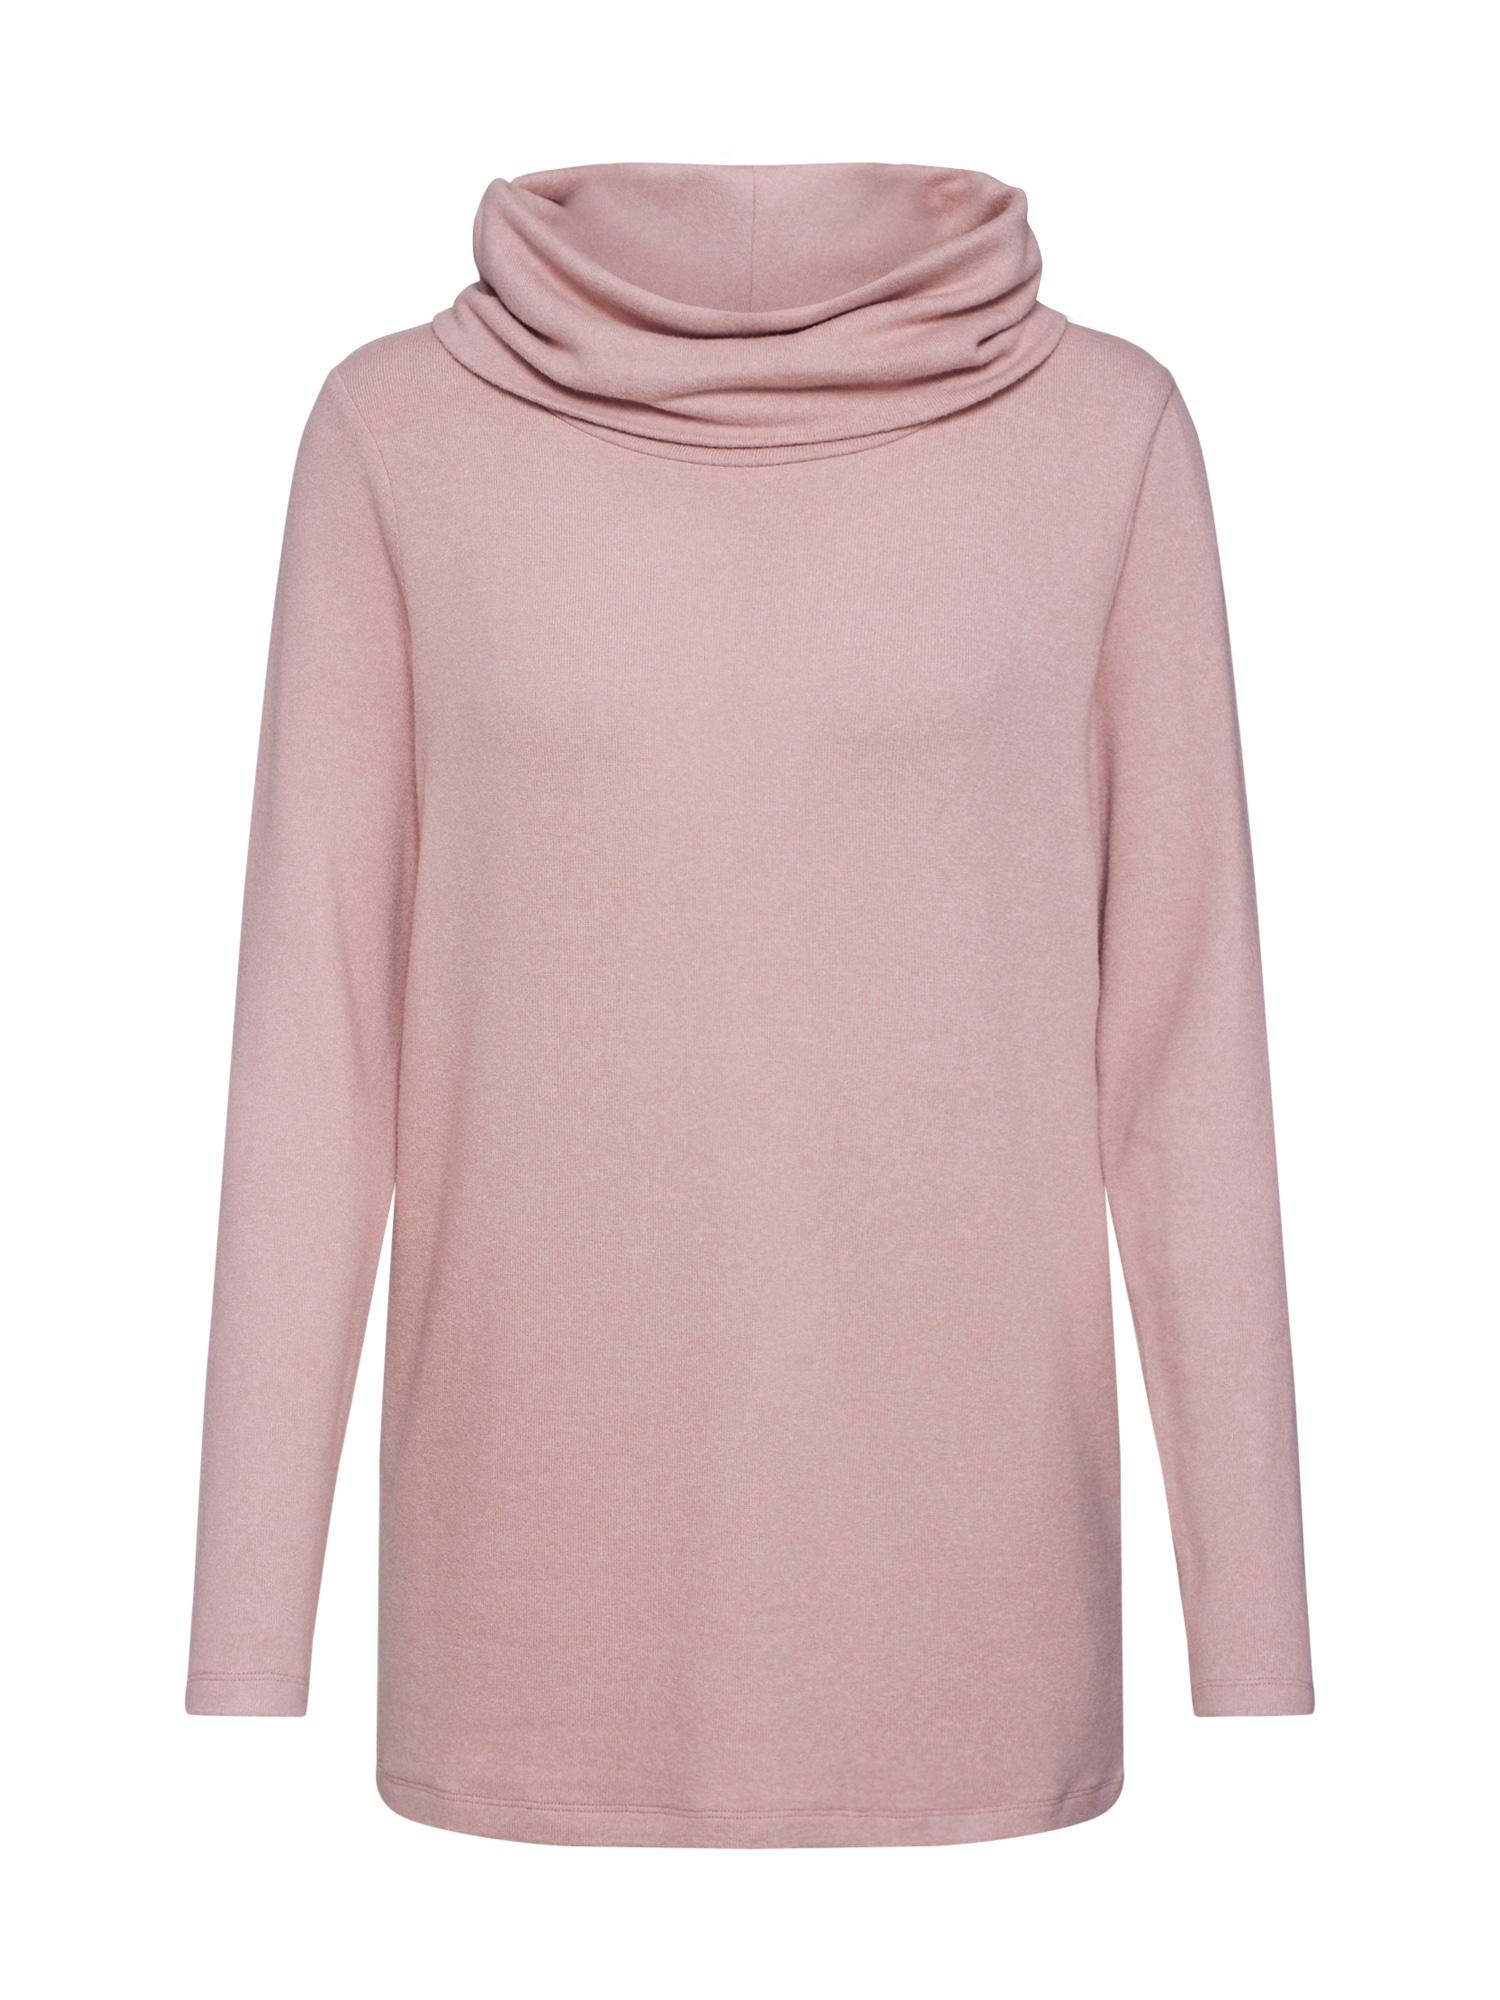 Pullover 'Geeske Jumper'   Bekleidung > Pullover > Sonstige Pullover   ABOUT YOU